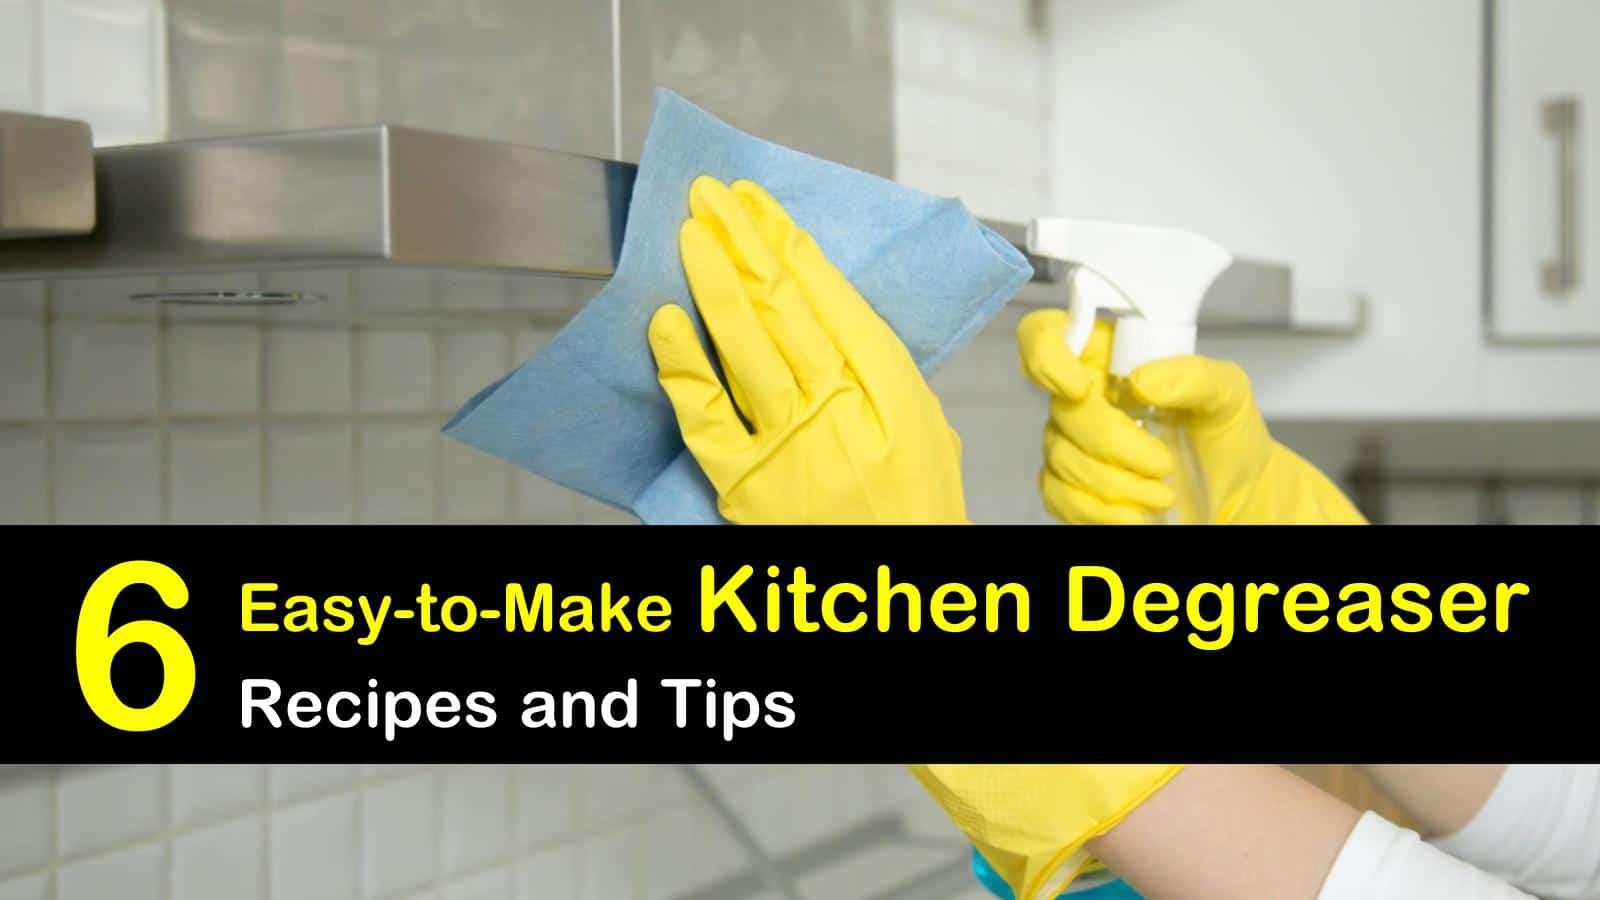 kitchen degreaser titleimg1